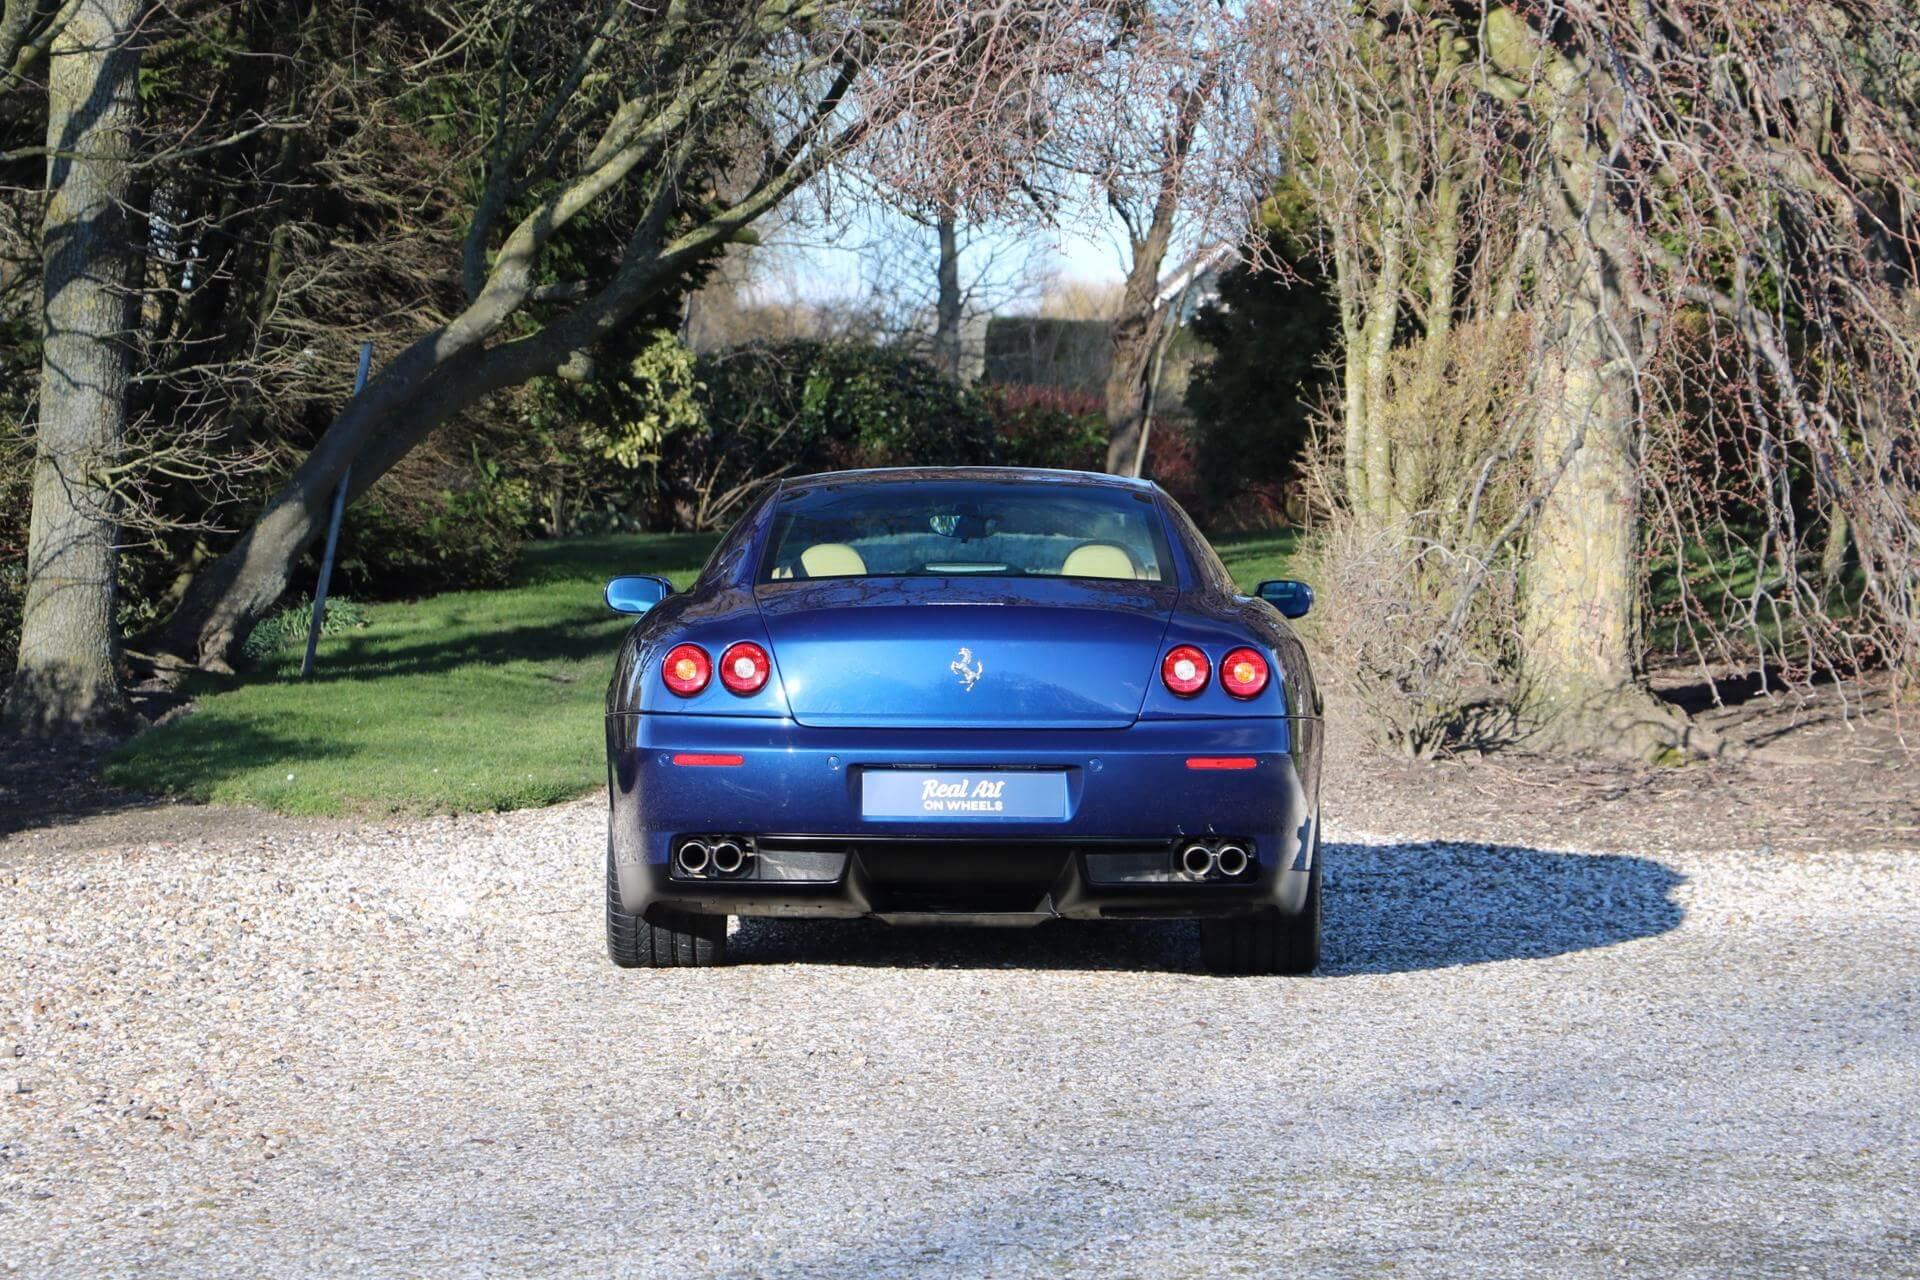 Real Art on Wheels | Ferrari 612 Manual